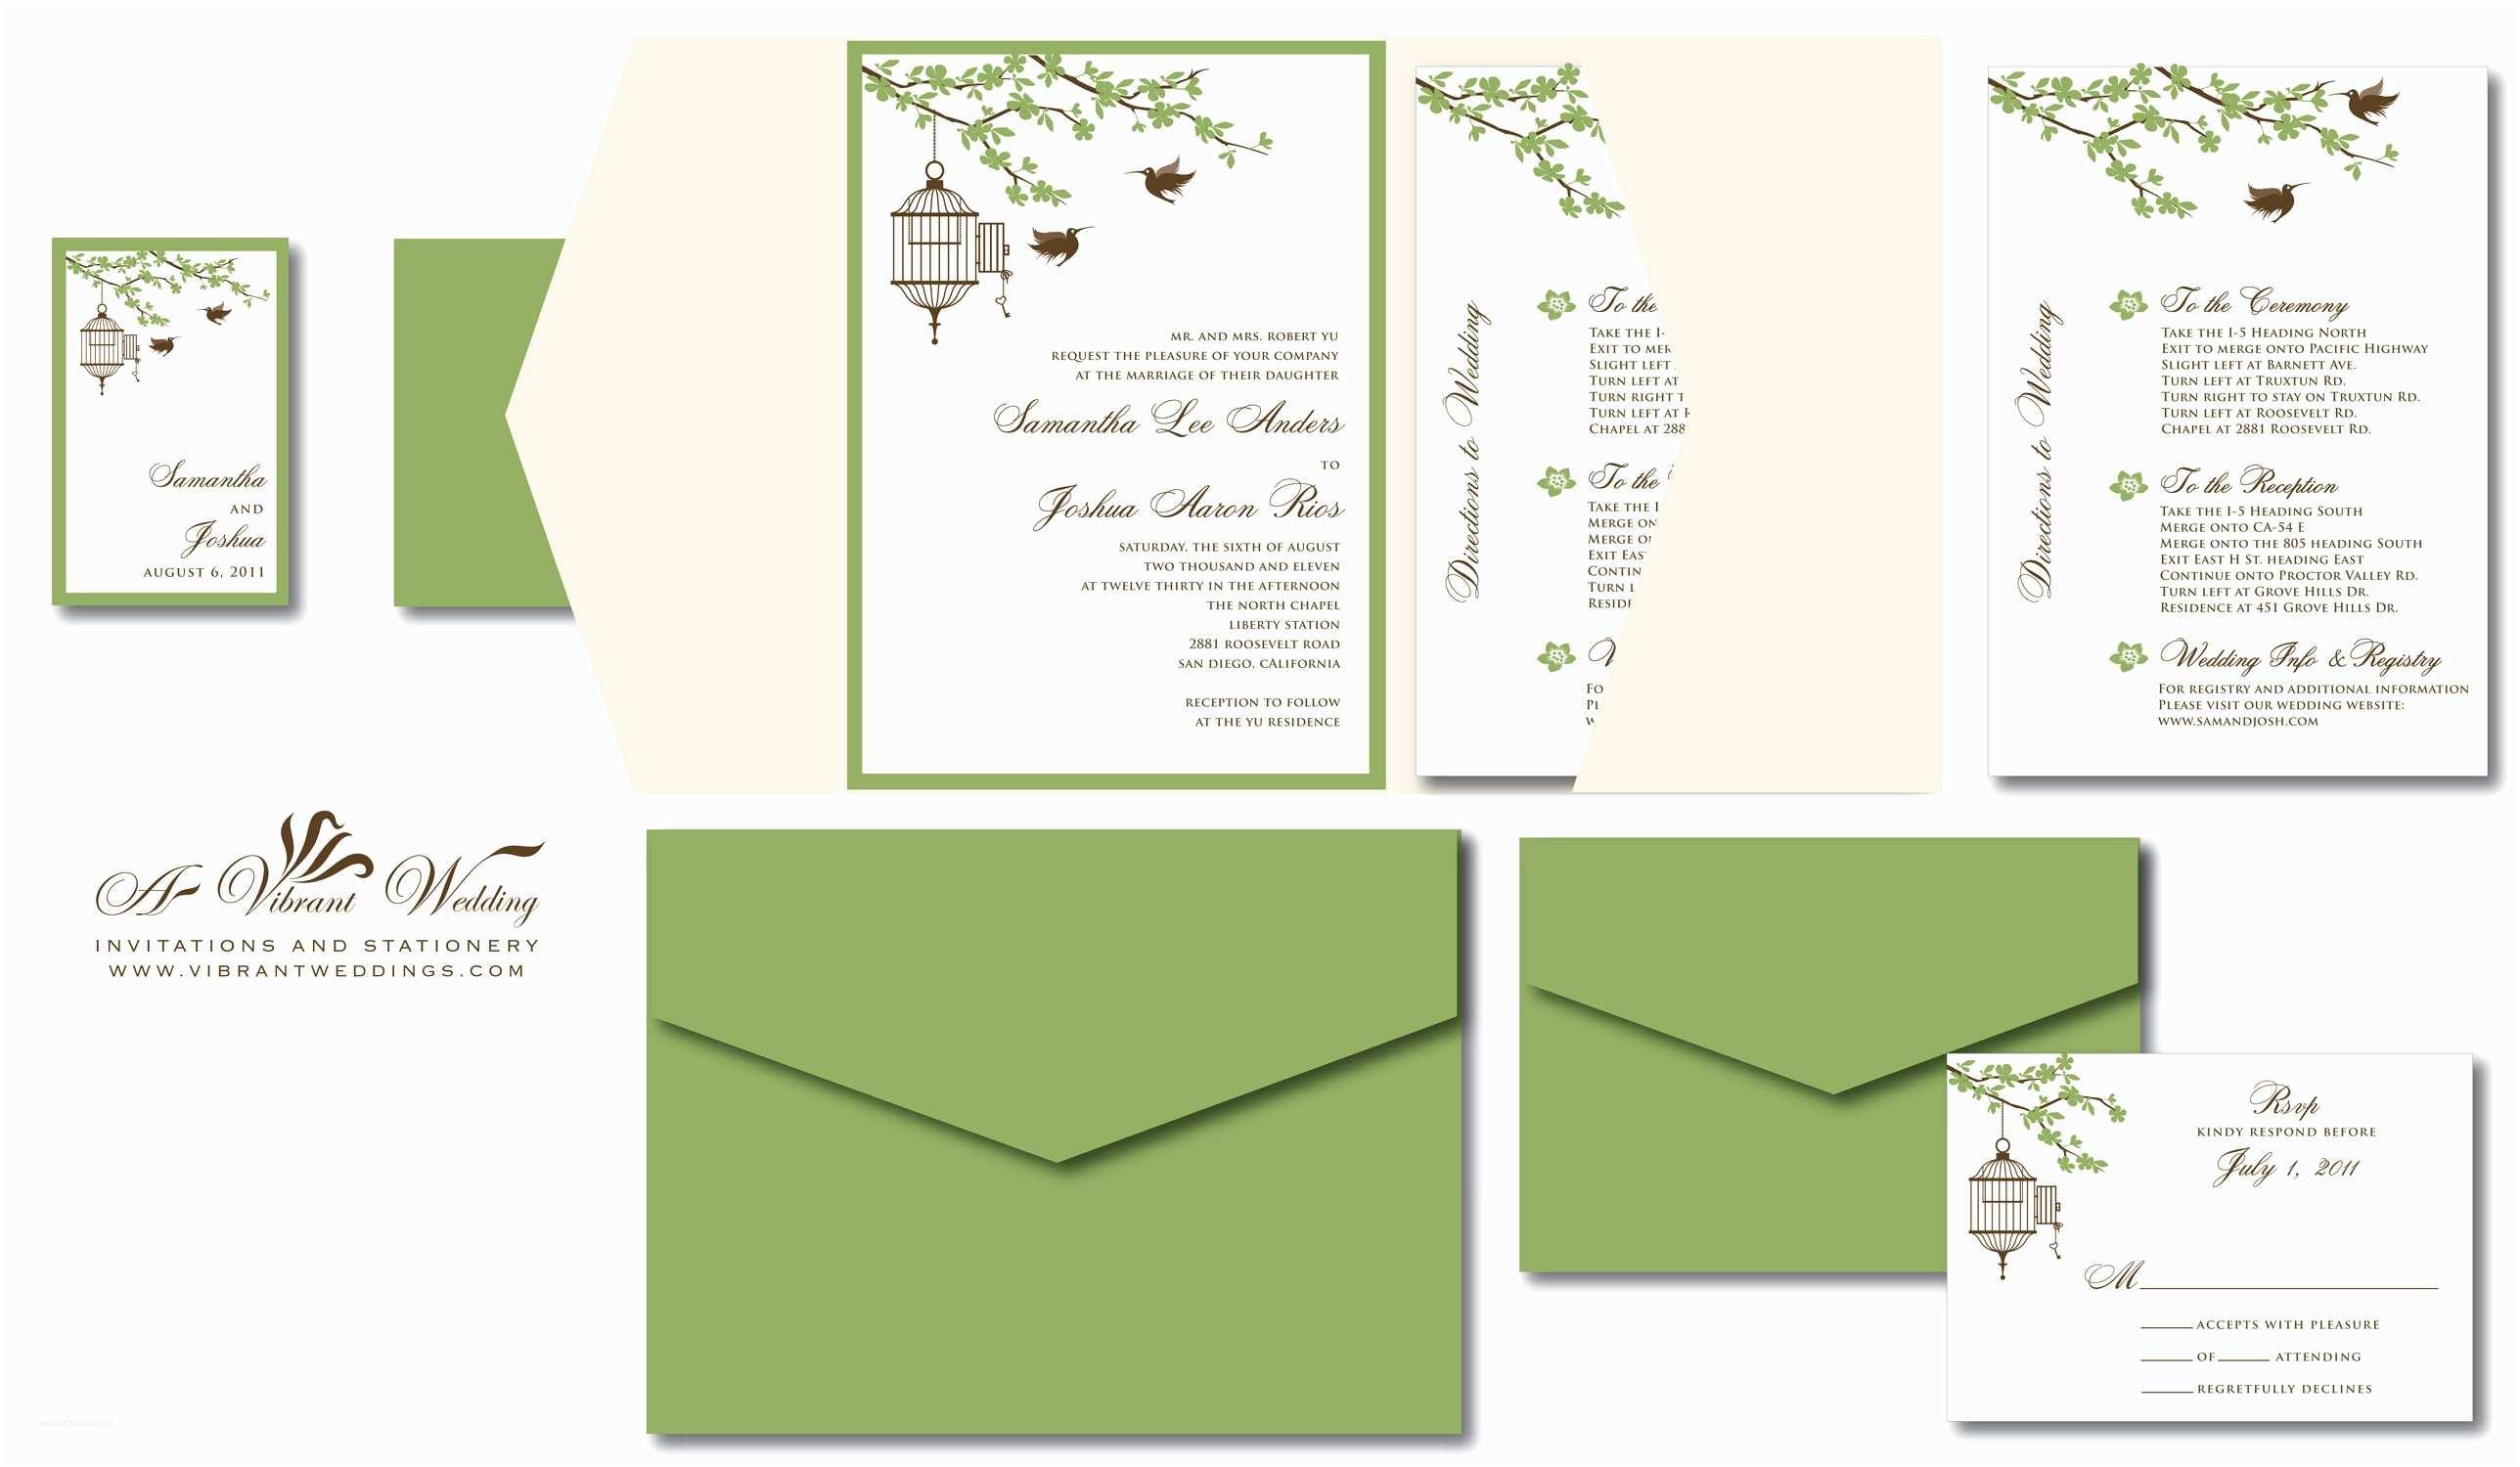 Green Wedding Invitations Sage Green Wedding Invitation – A Vibrant Wedding